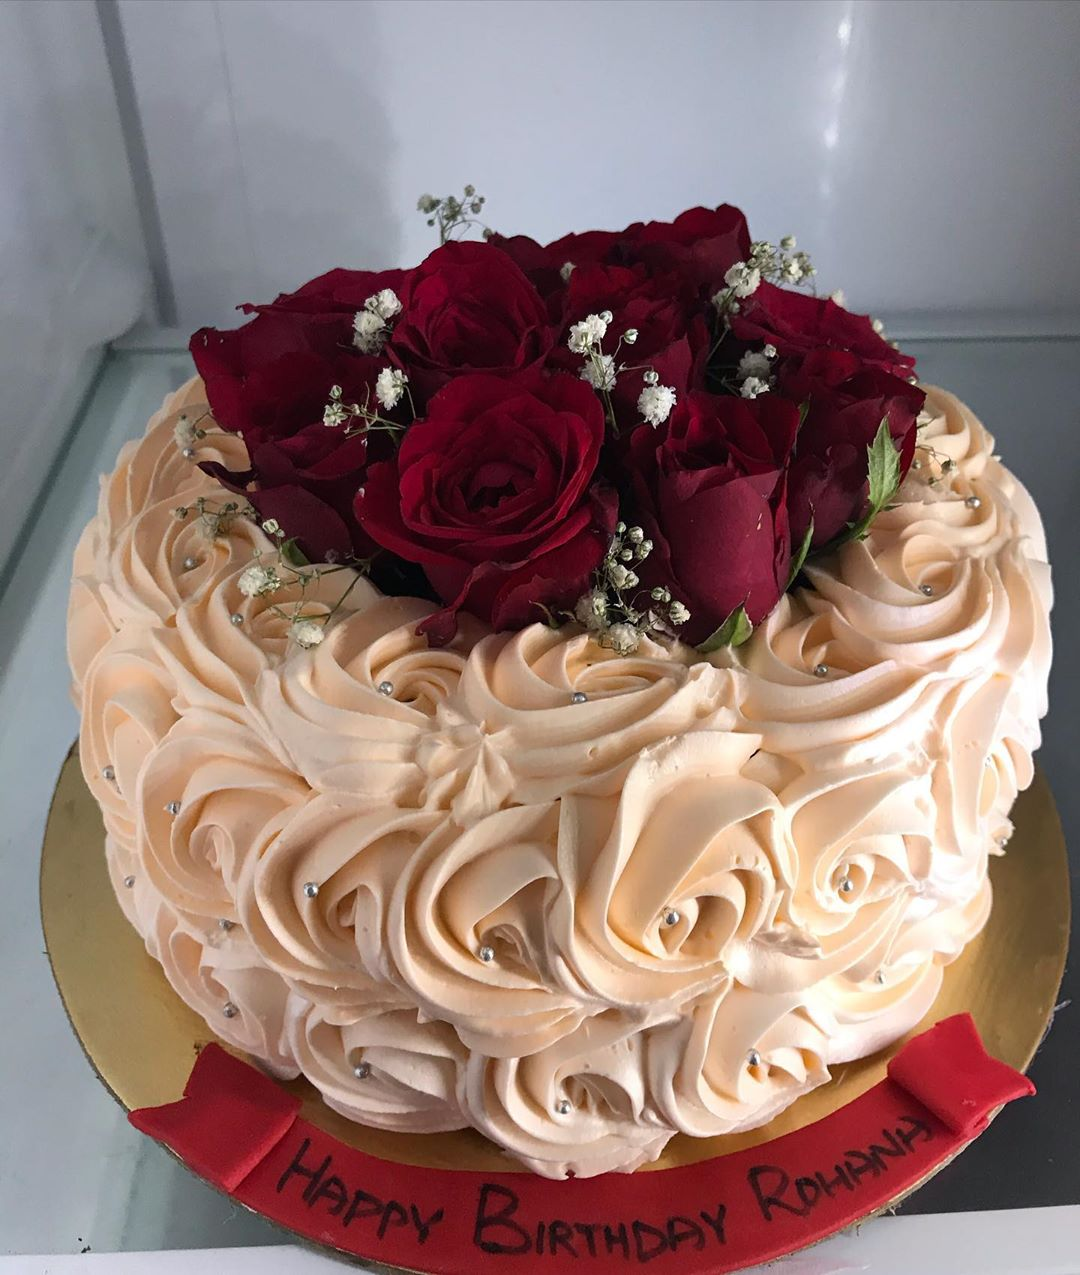 Astonishing Valentine Special Rose Cake Funny Birthday Cards Online Elaedamsfinfo